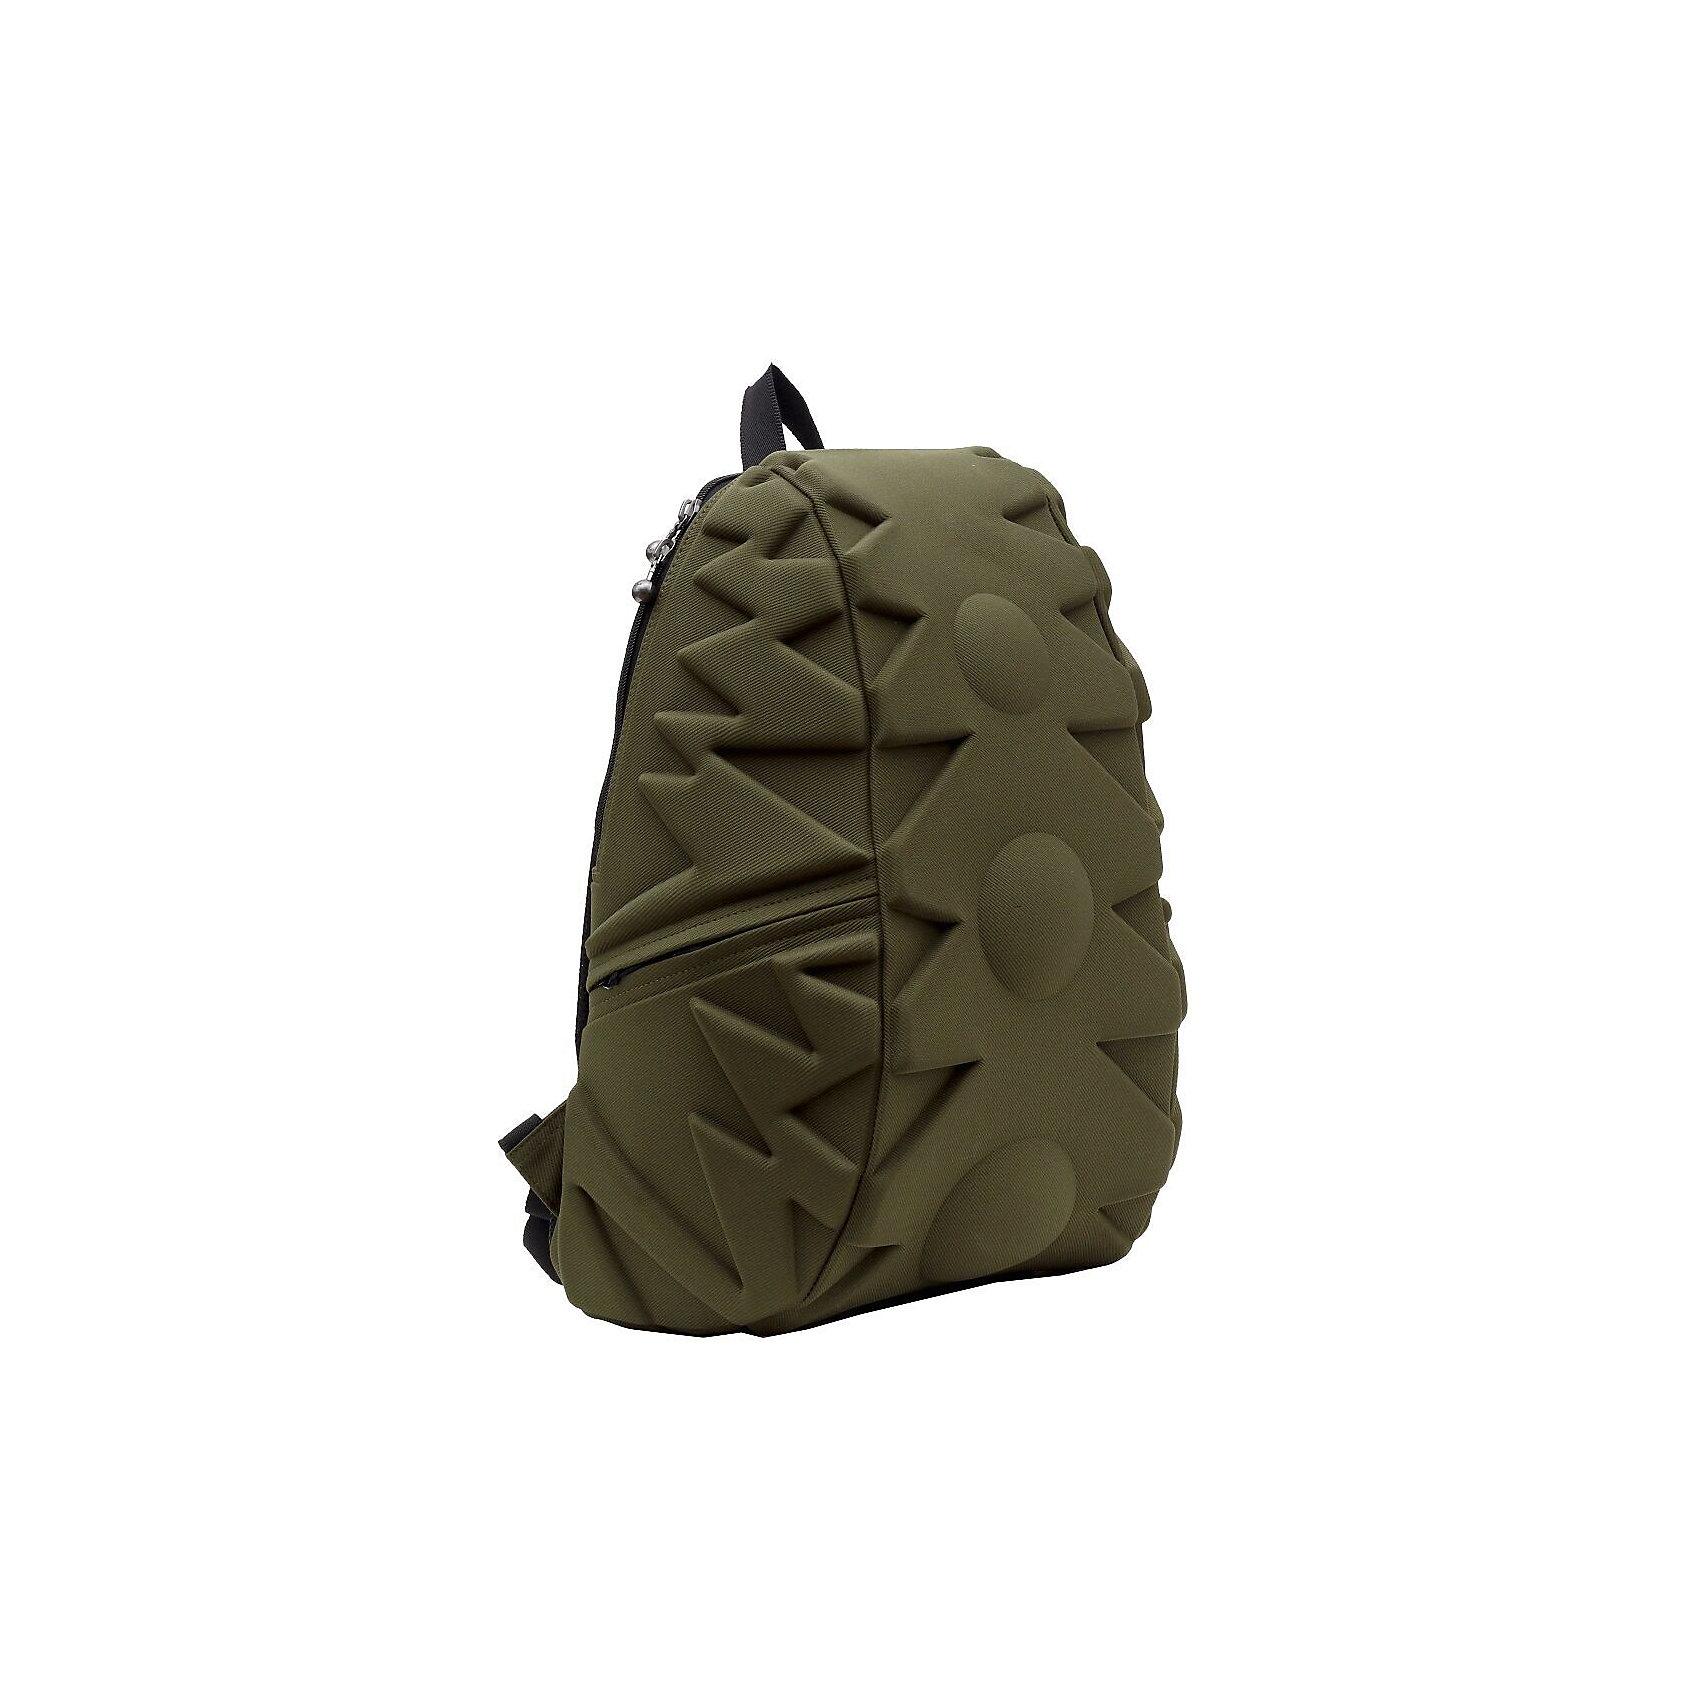 Рюкзак Exo Full, цвет Green (хаки)Рюкзаки<br>Вес: 0,8 кг<br>Размер: 46х36х20 см<br>Состав: рюкзак<br>Наличие светоотражающих элементов: нет<br>Материал: полиспандекс<br><br>Ширина мм: 460<br>Глубина мм: 360<br>Высота мм: 200<br>Вес г: 800<br>Возраст от месяцев: 60<br>Возраст до месяцев: 720<br>Пол: Унисекс<br>Возраст: Детский<br>SKU: 7054108